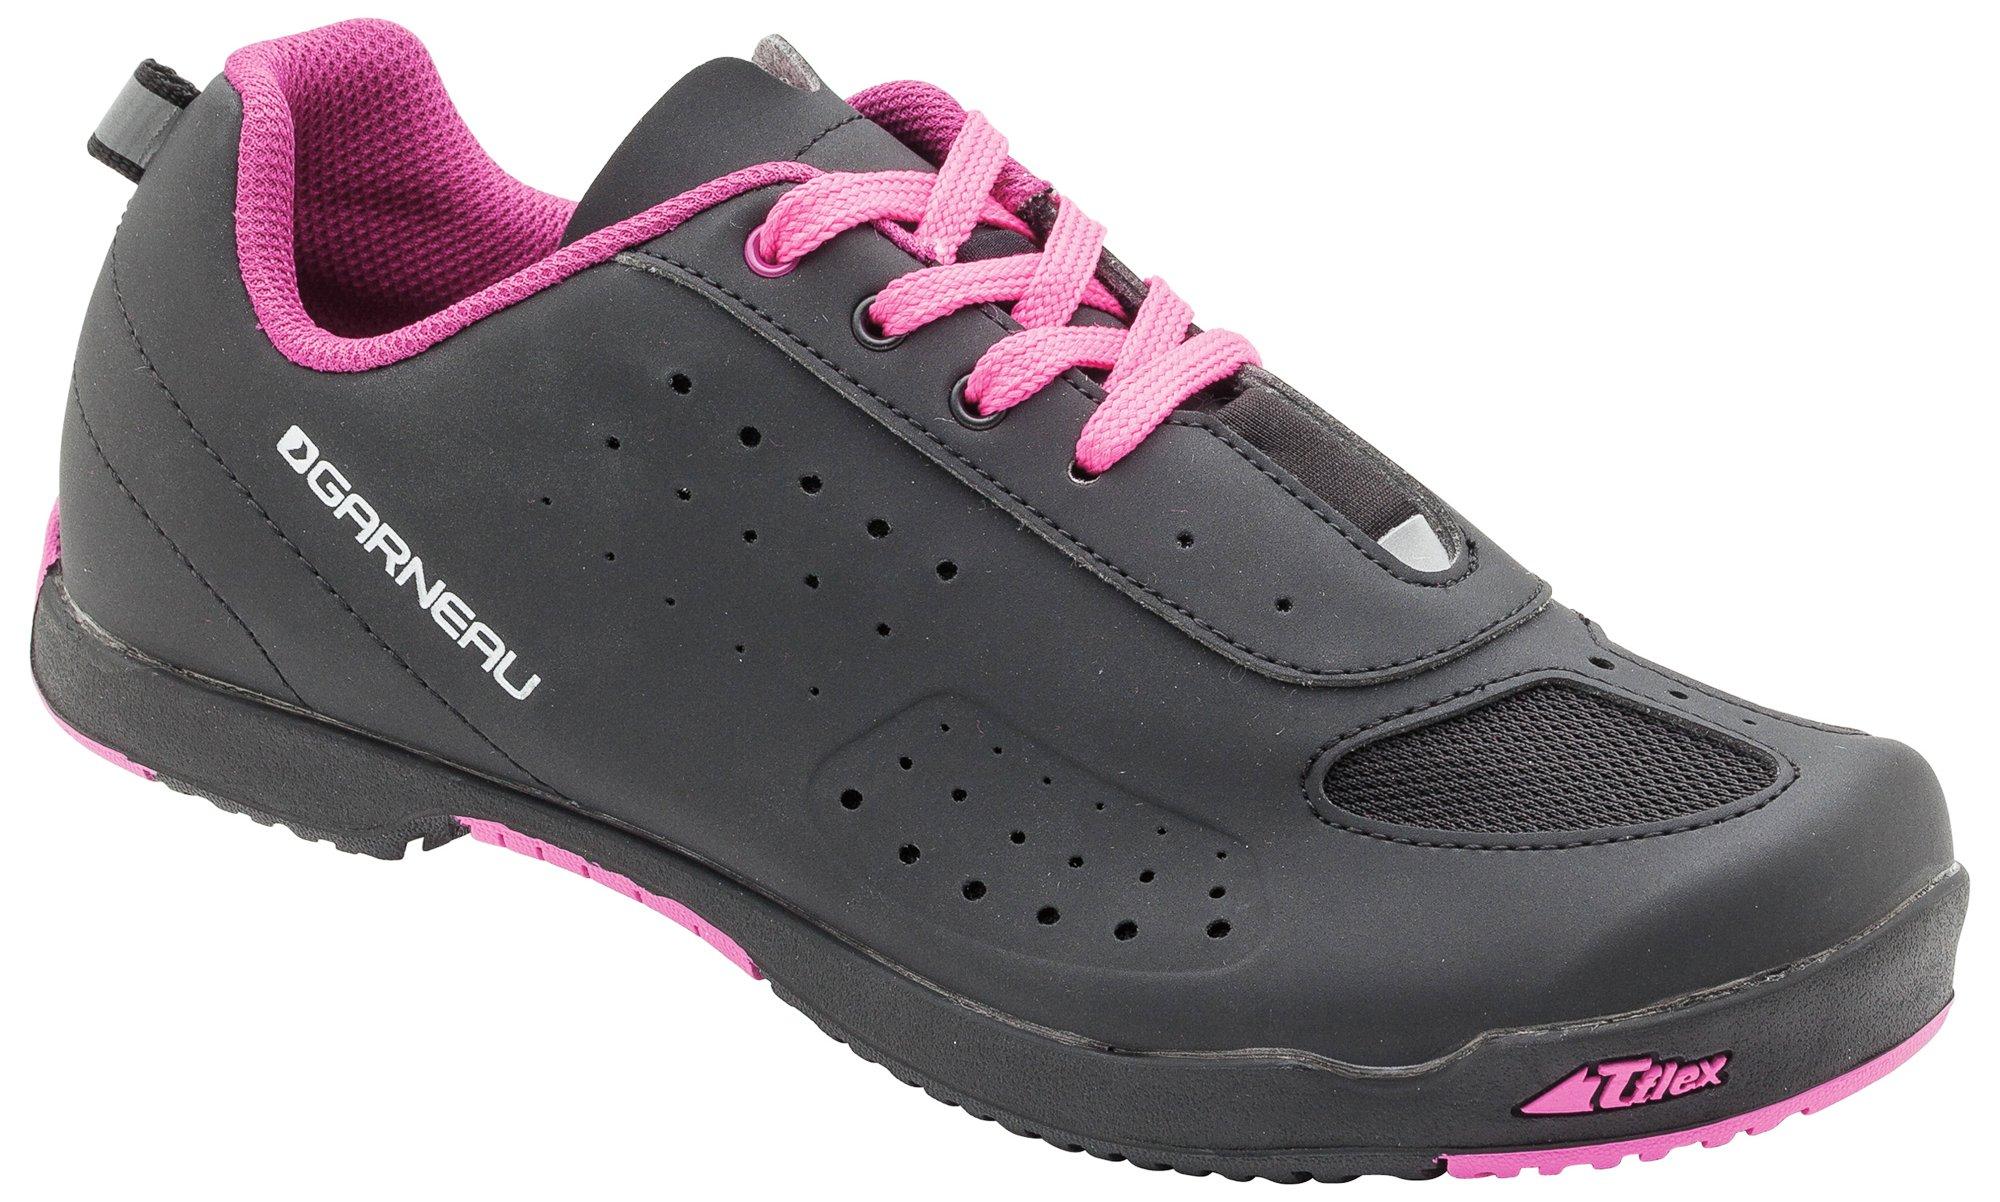 Louis Garneau - Women's Urban Bike Shoes, Black/Pink, US (11), EU (42)